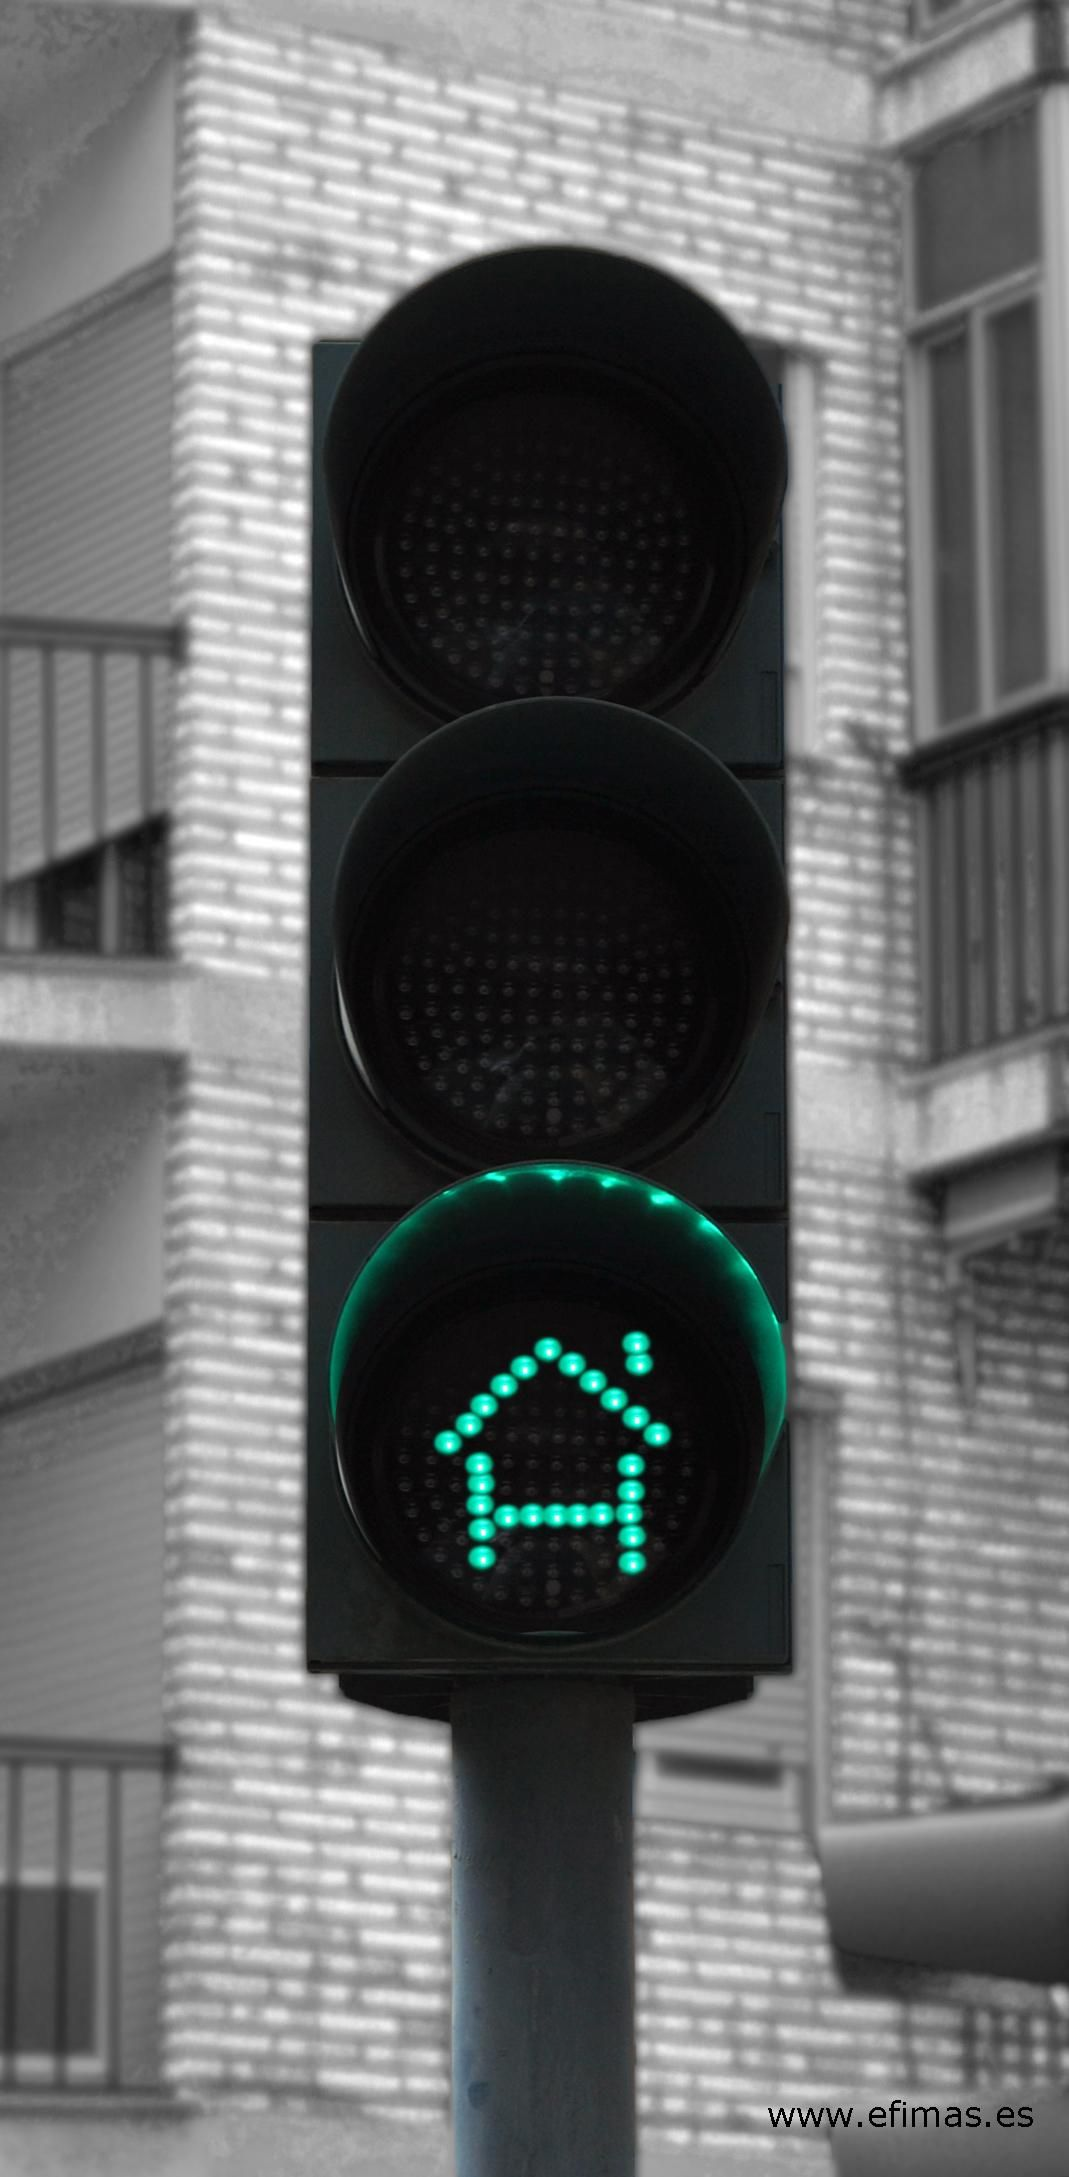 Certificación energética de edificios. Da luz verde a tu casa. build in green traffic light. www.efimas.es